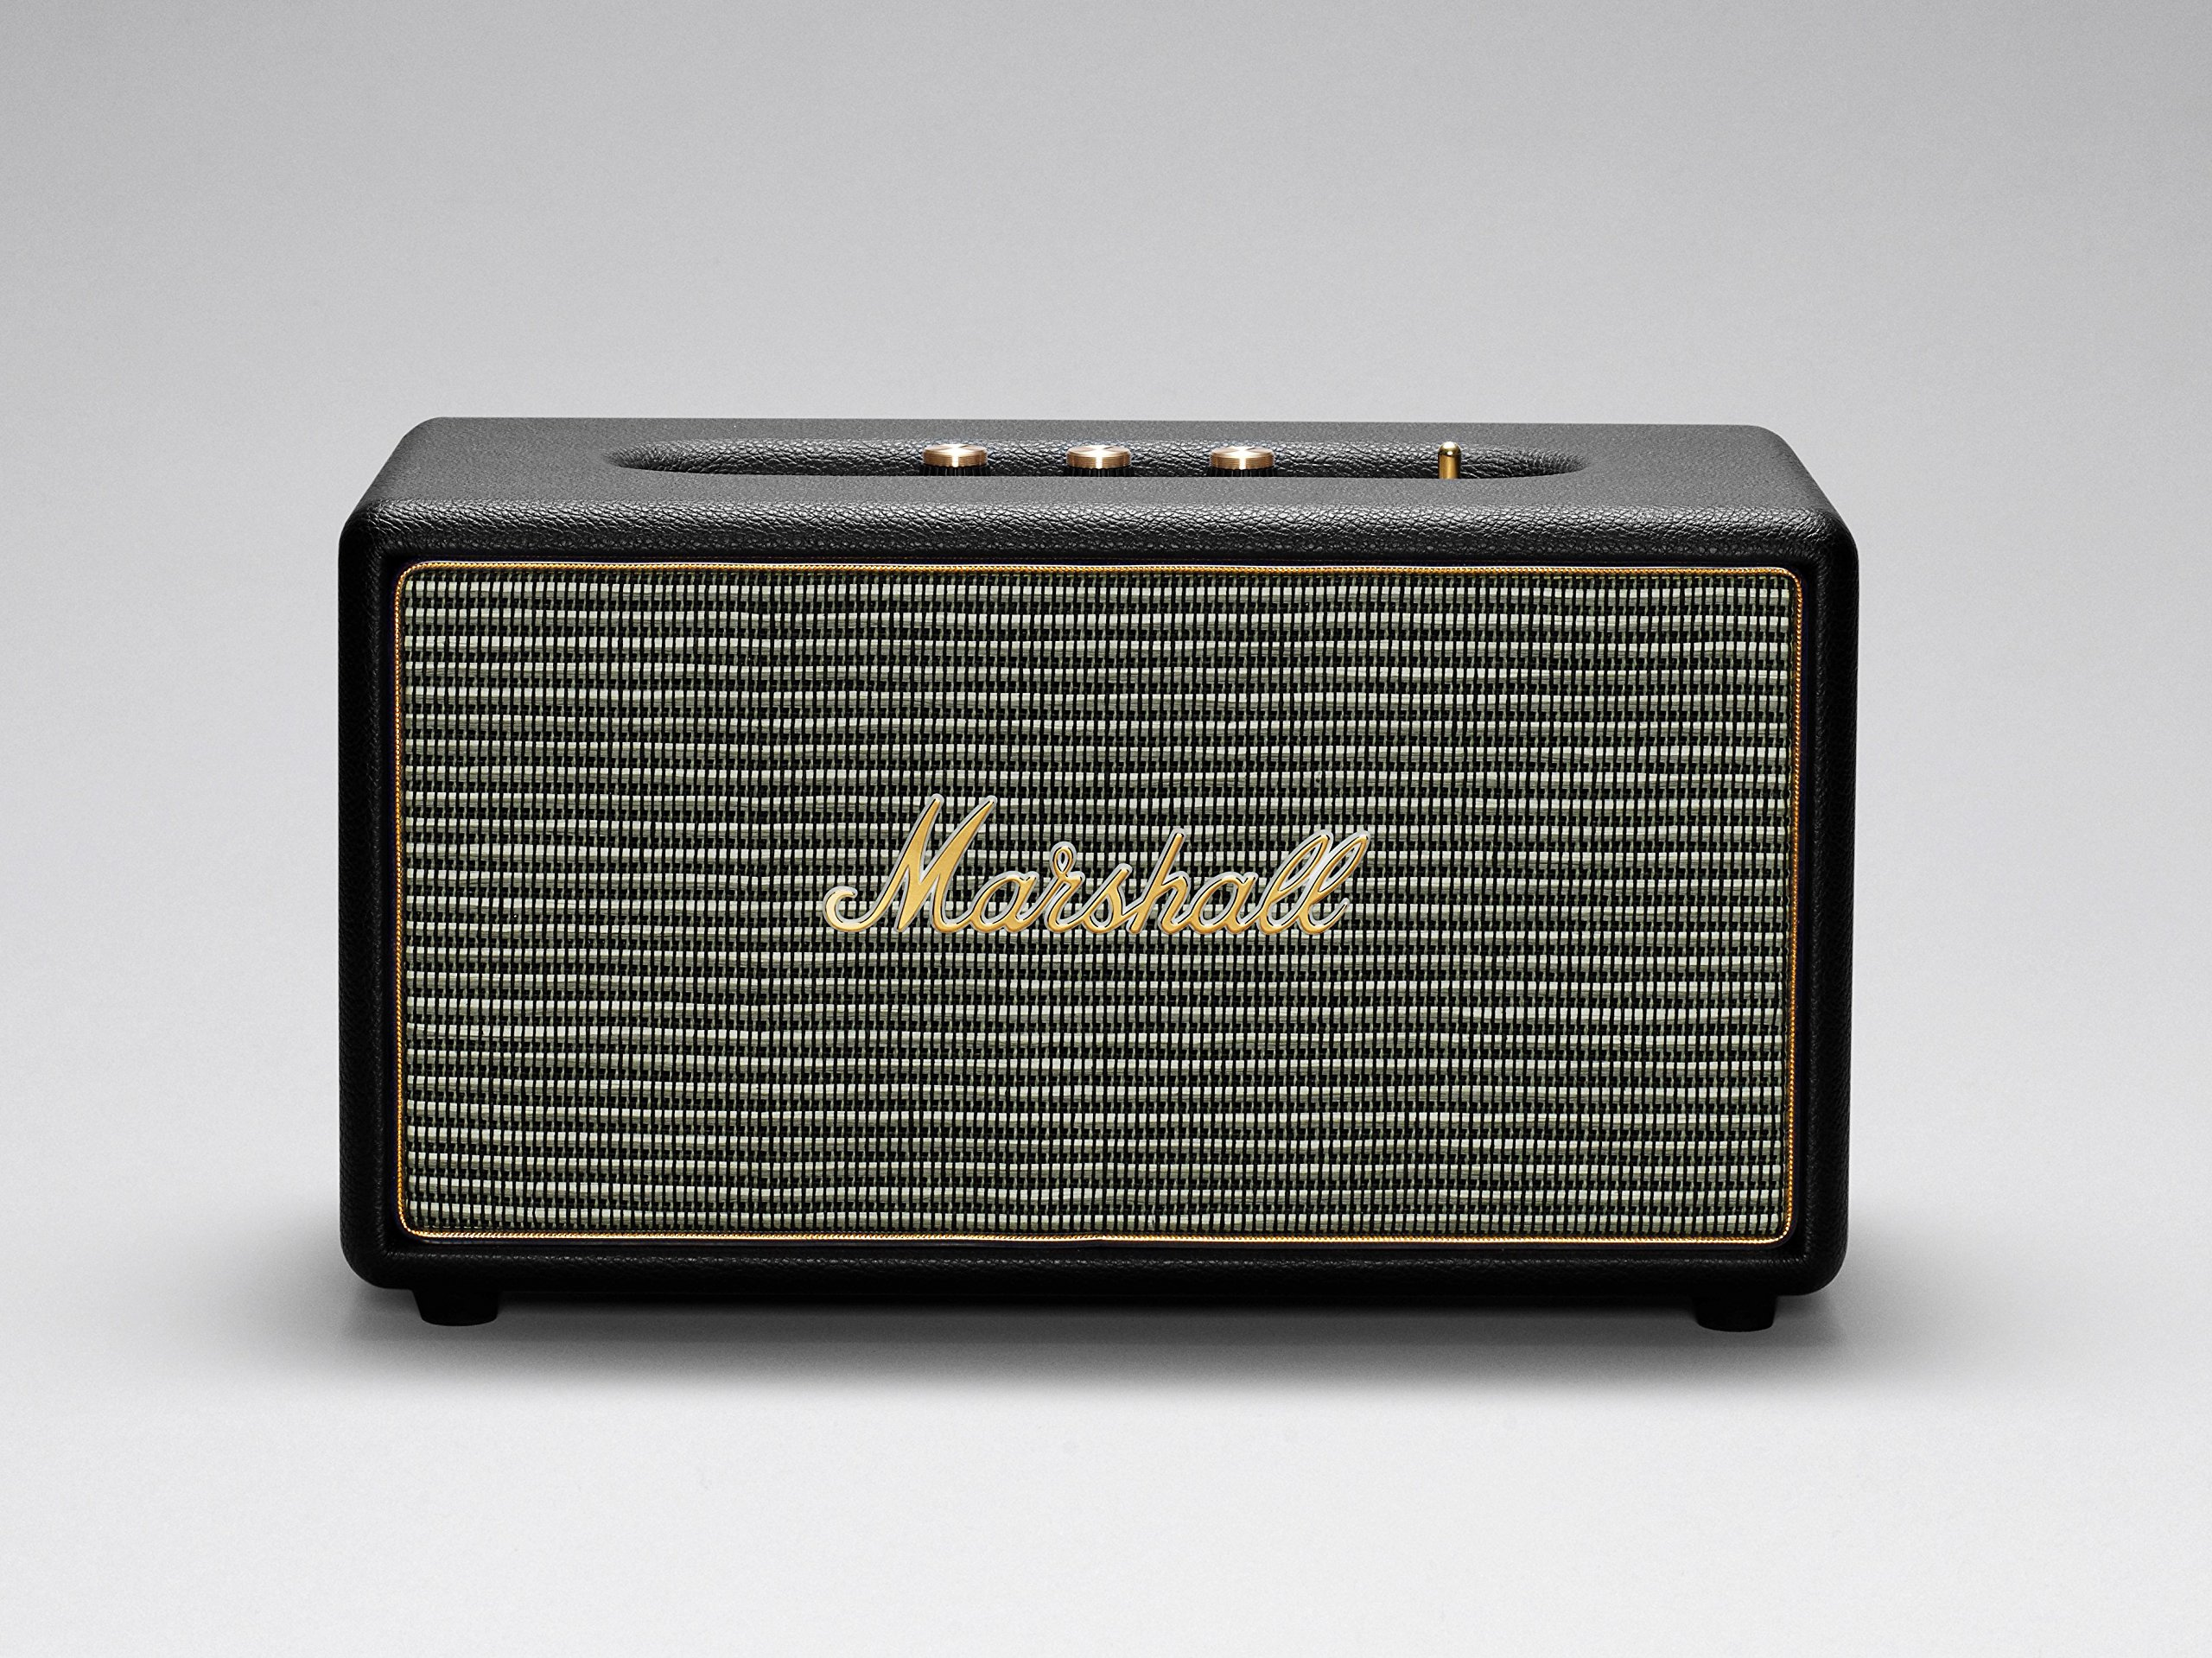 Marshall Stanmore Bluetooth Speaker, Black (04091627) by Marshall (Image #4)